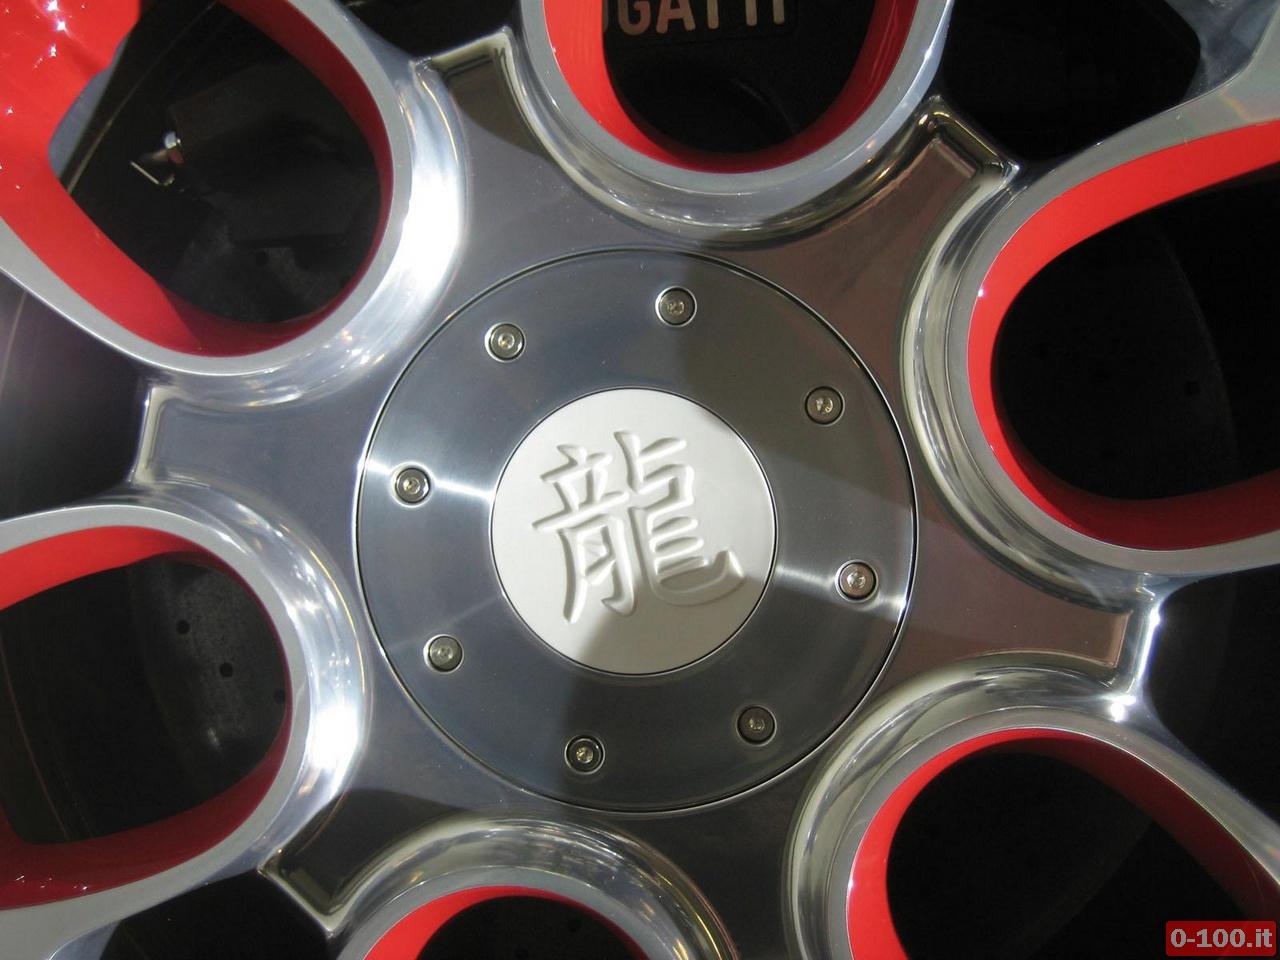 bugatti_veyron_grand_sport_wei-long_2012_0-100_45